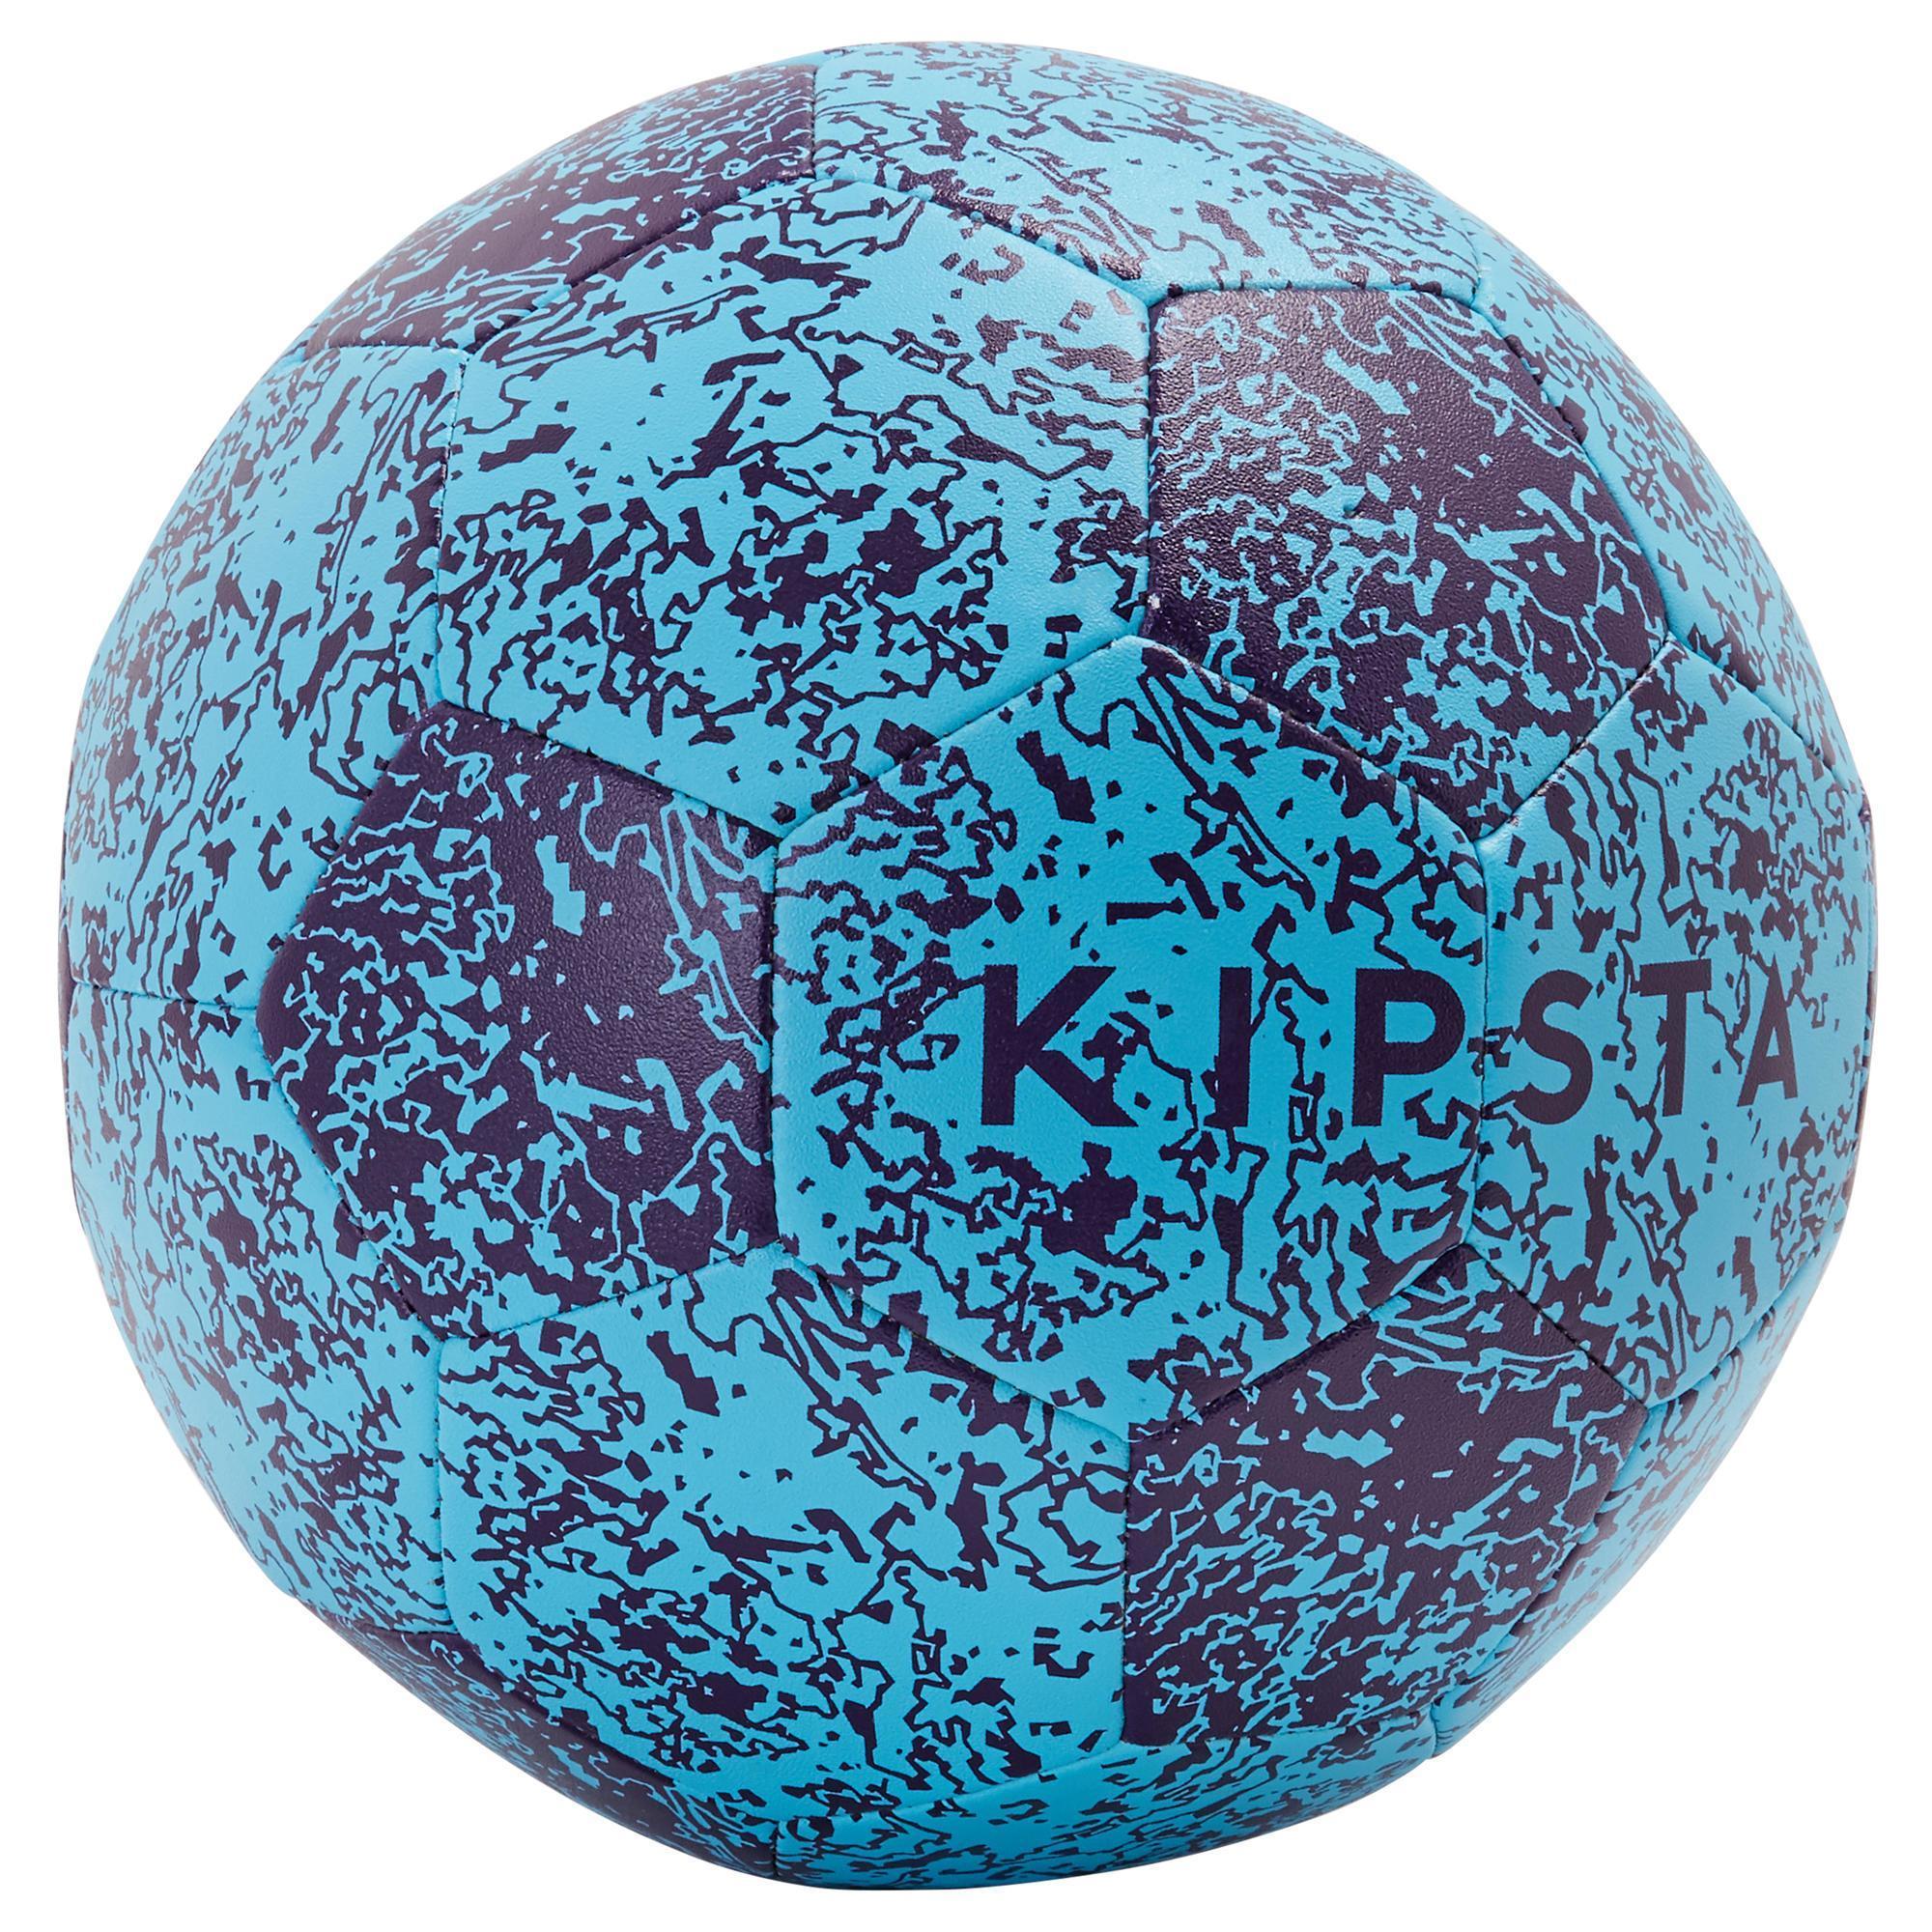 Kipsta Voetbal Softball XLight maat 5 290 gram blauw kopen